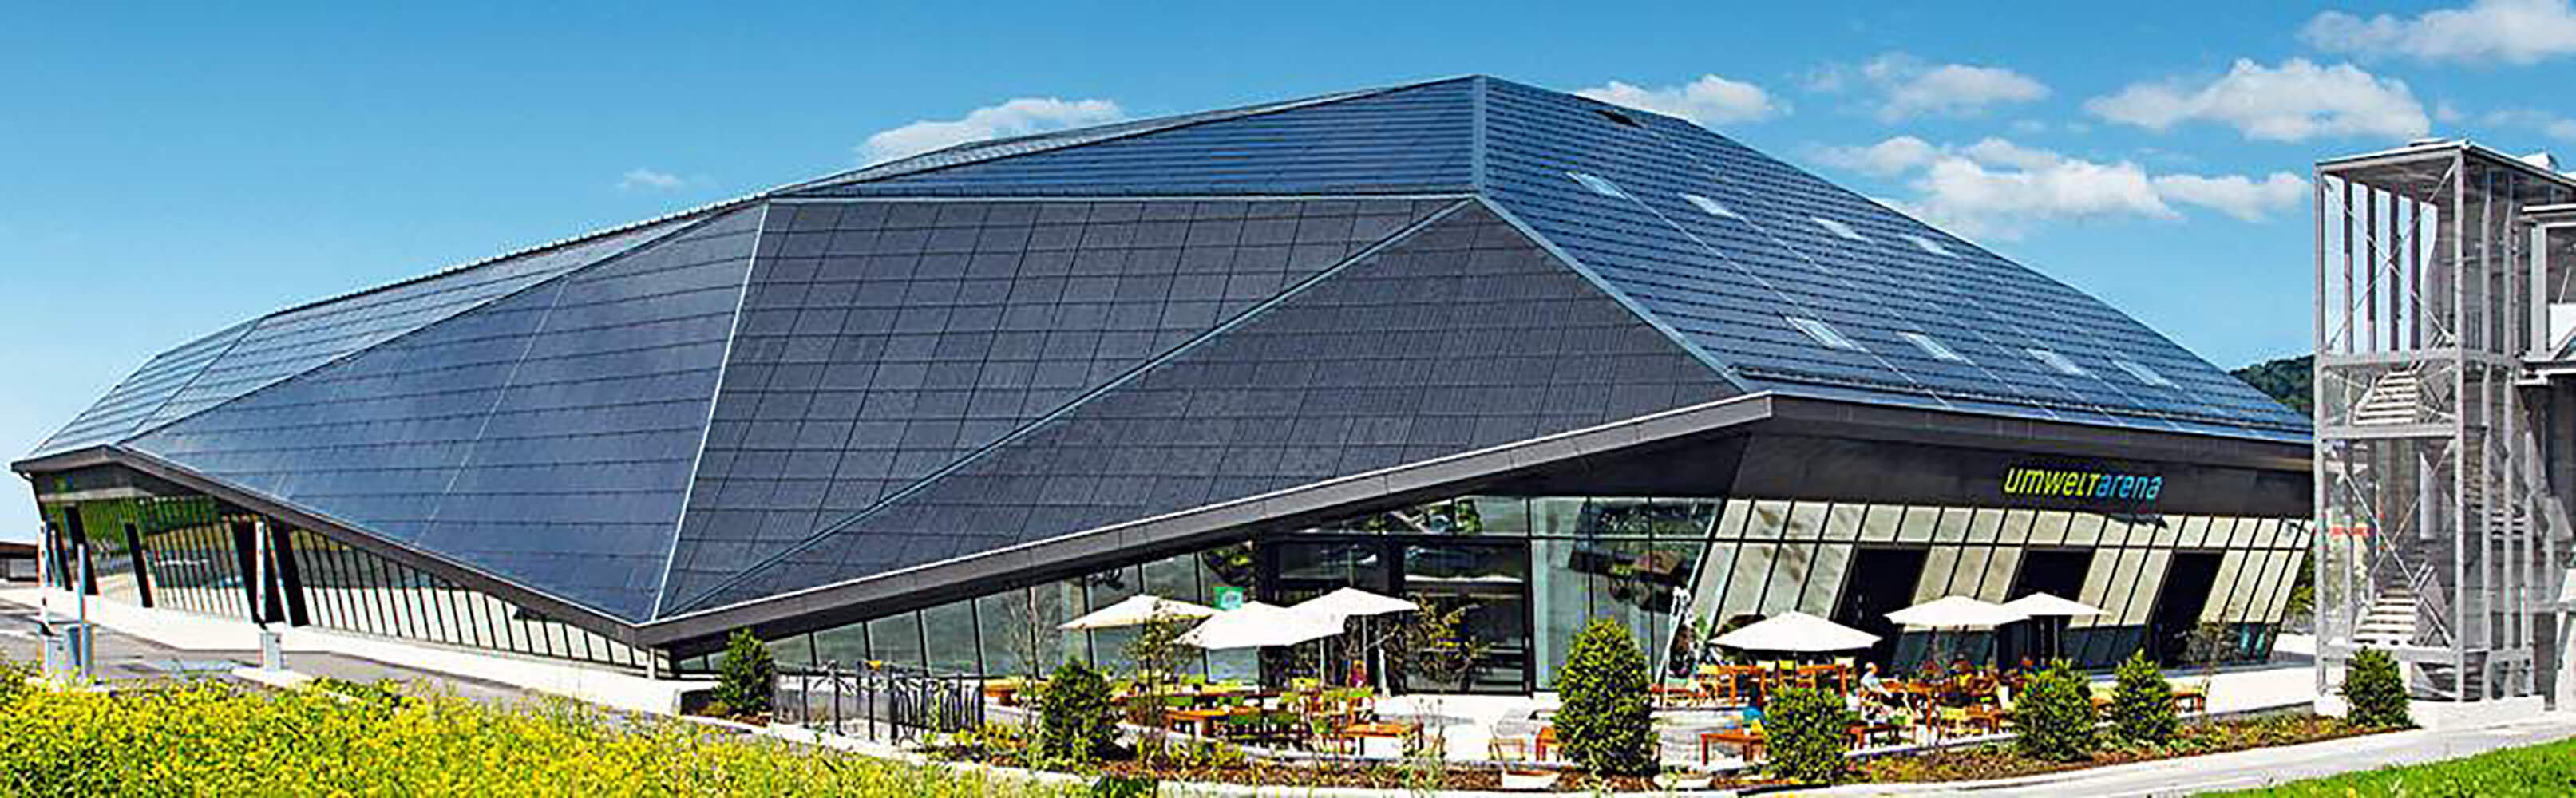 Umwelt Arena Schweiz 1